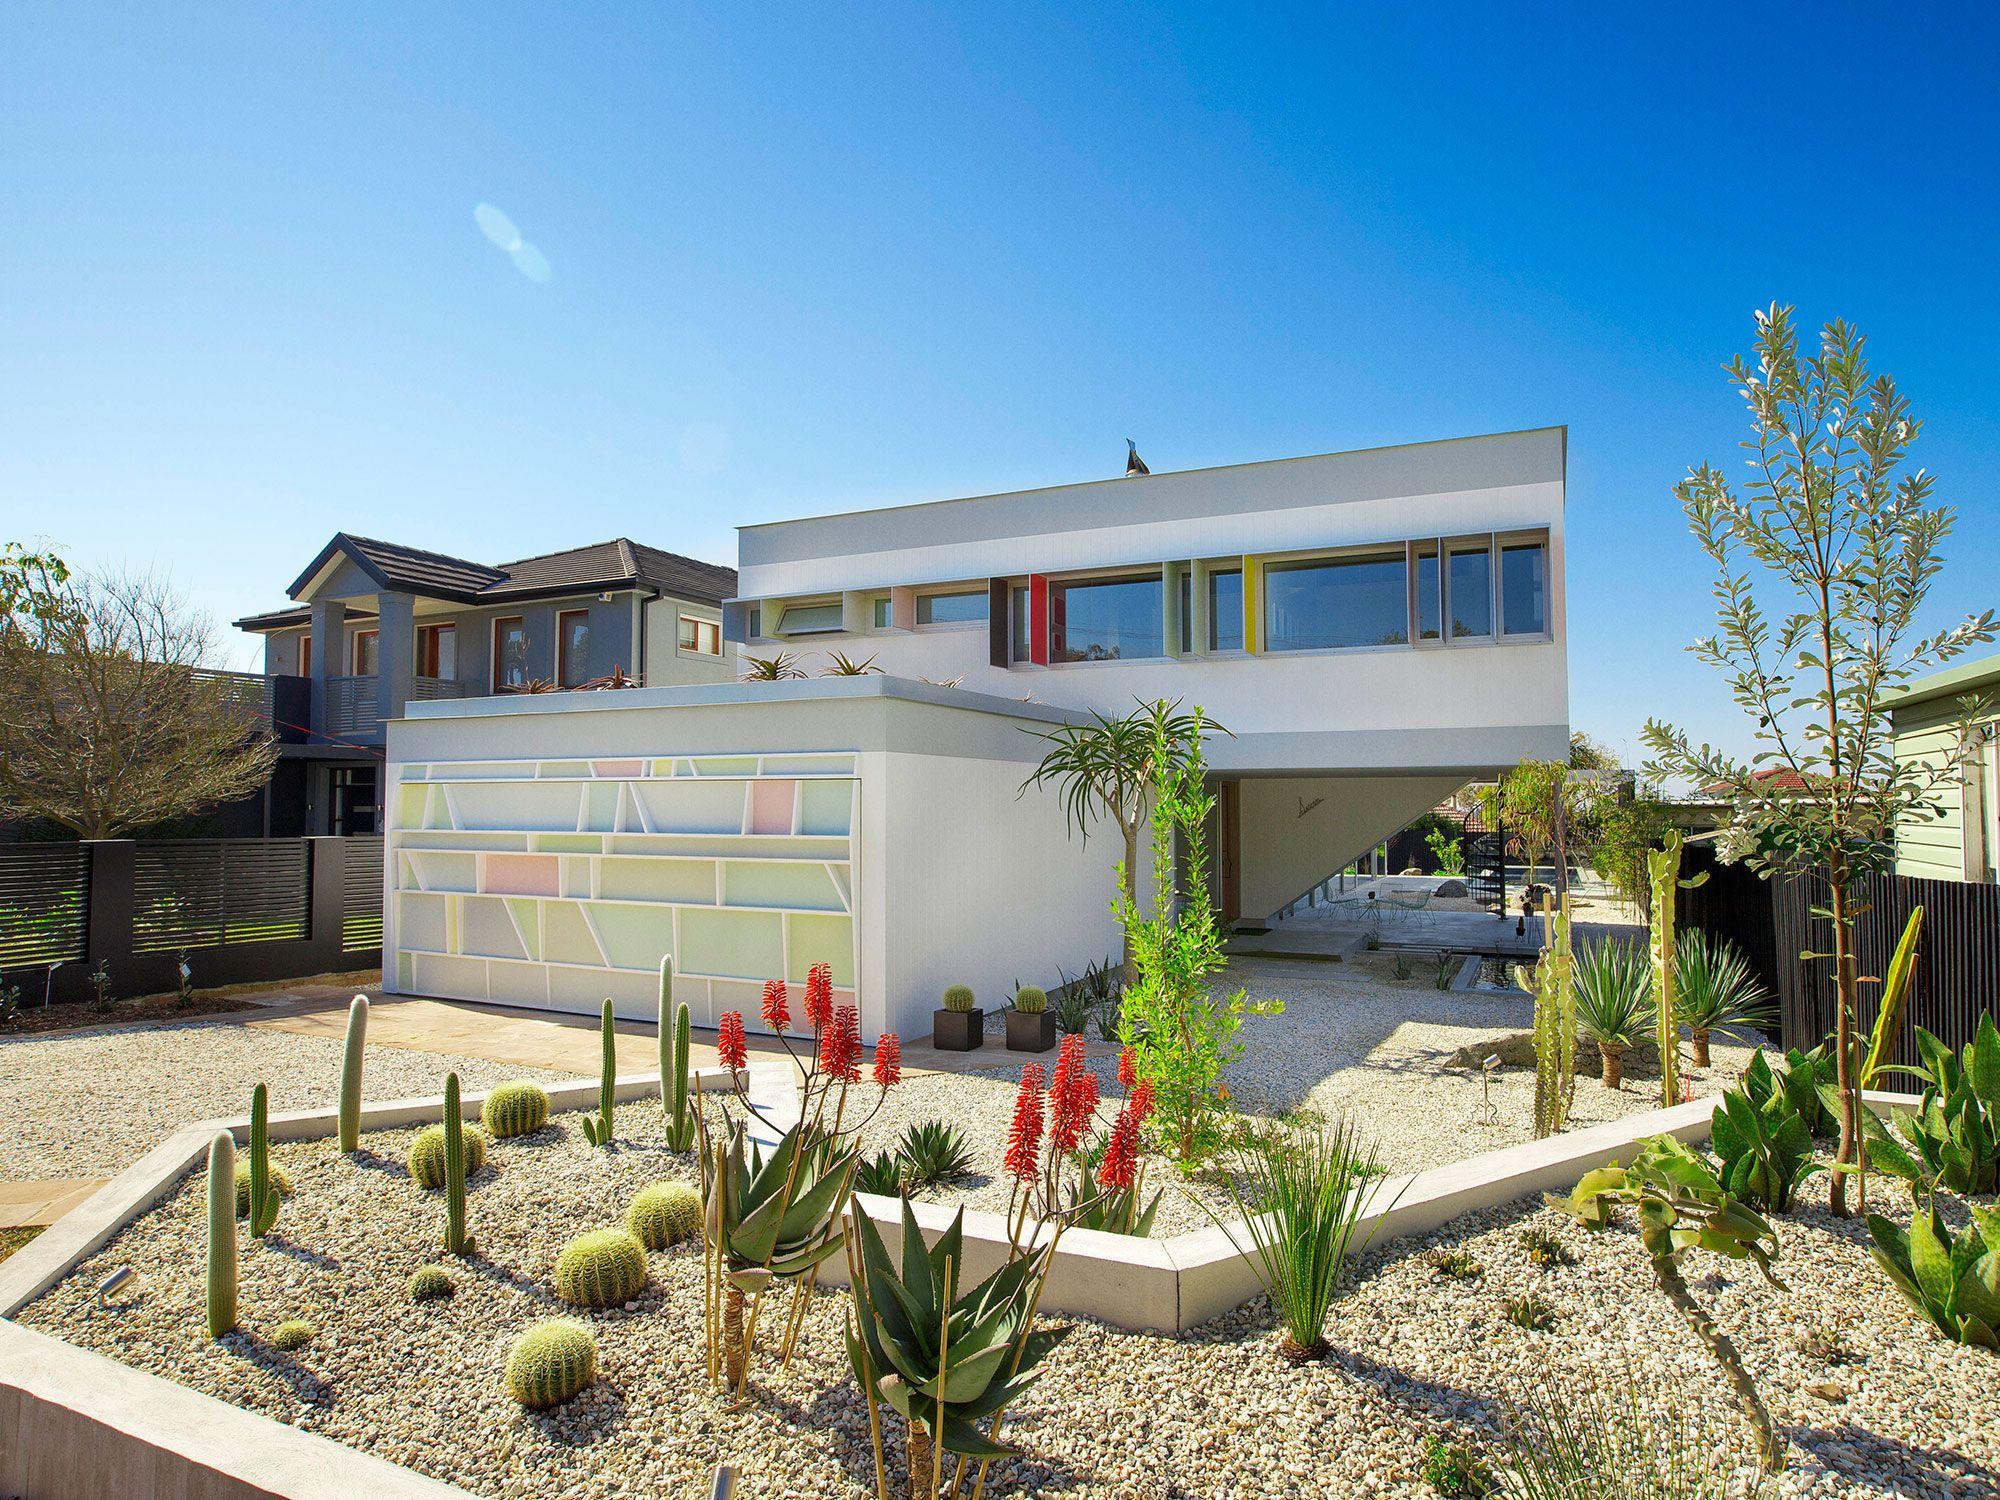 dream homes stunning house designs interiors decor - Beach House Design 1950s